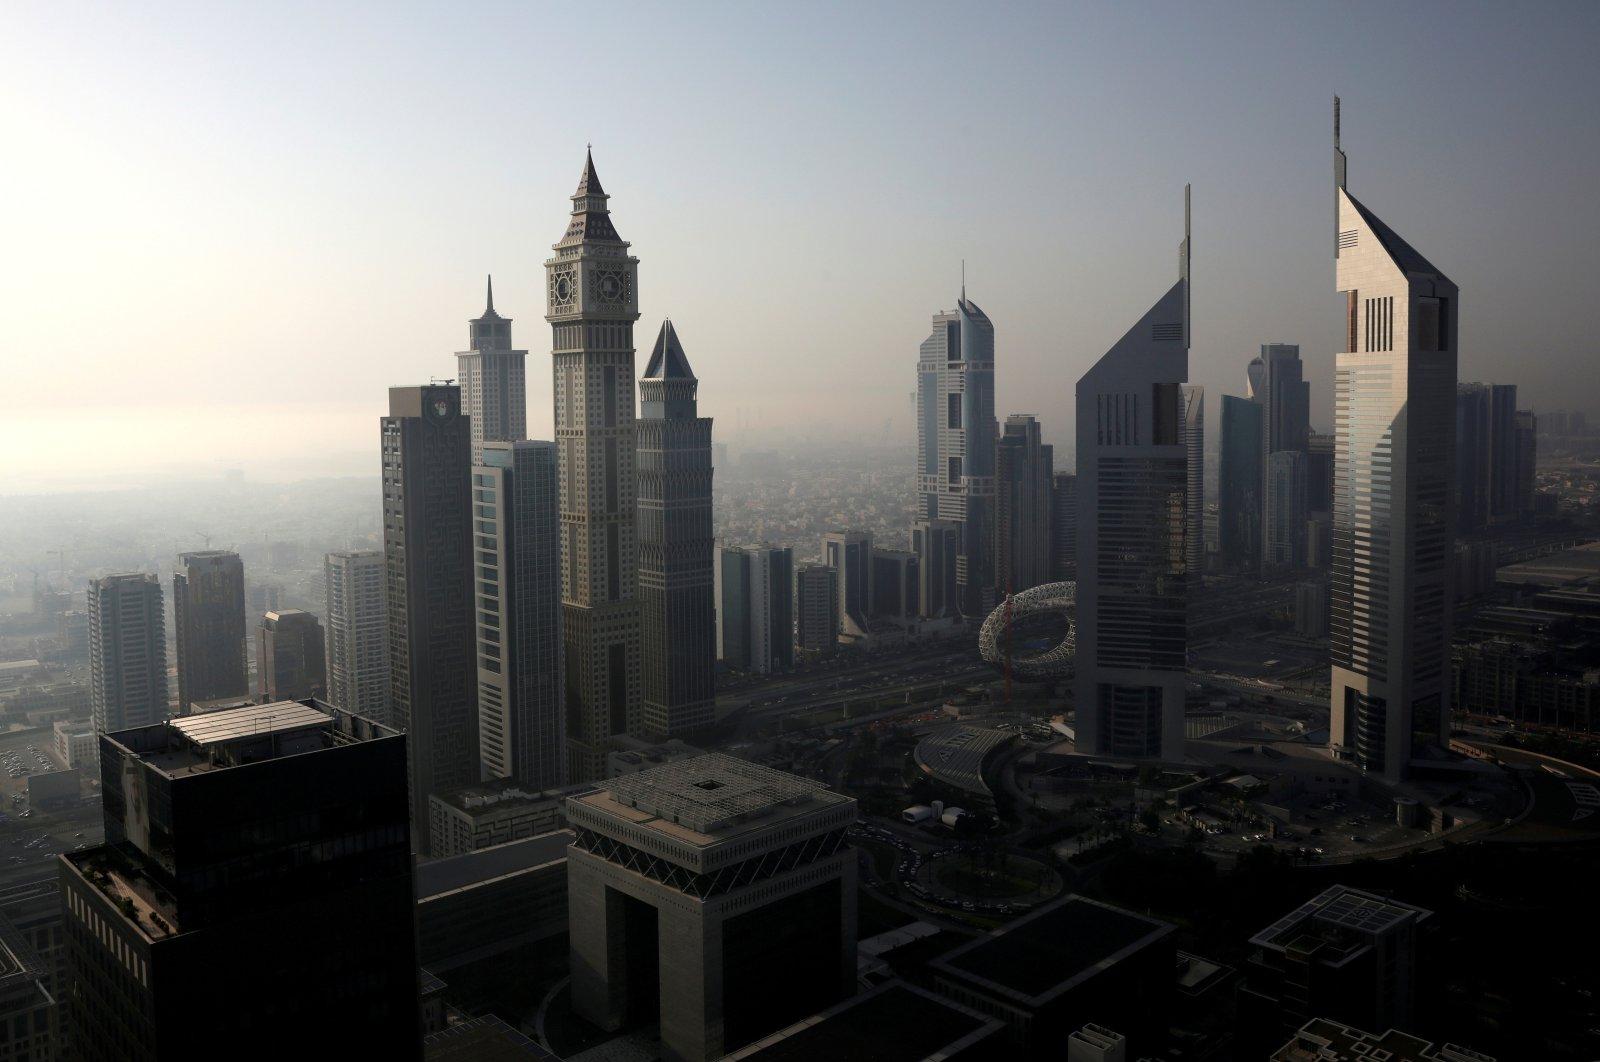 A general view of Dubai International Financial Centre (DIFC) among high-rise towers in Dubai, United Arab Emirates June 18, 2019. (REUTERS Photo)